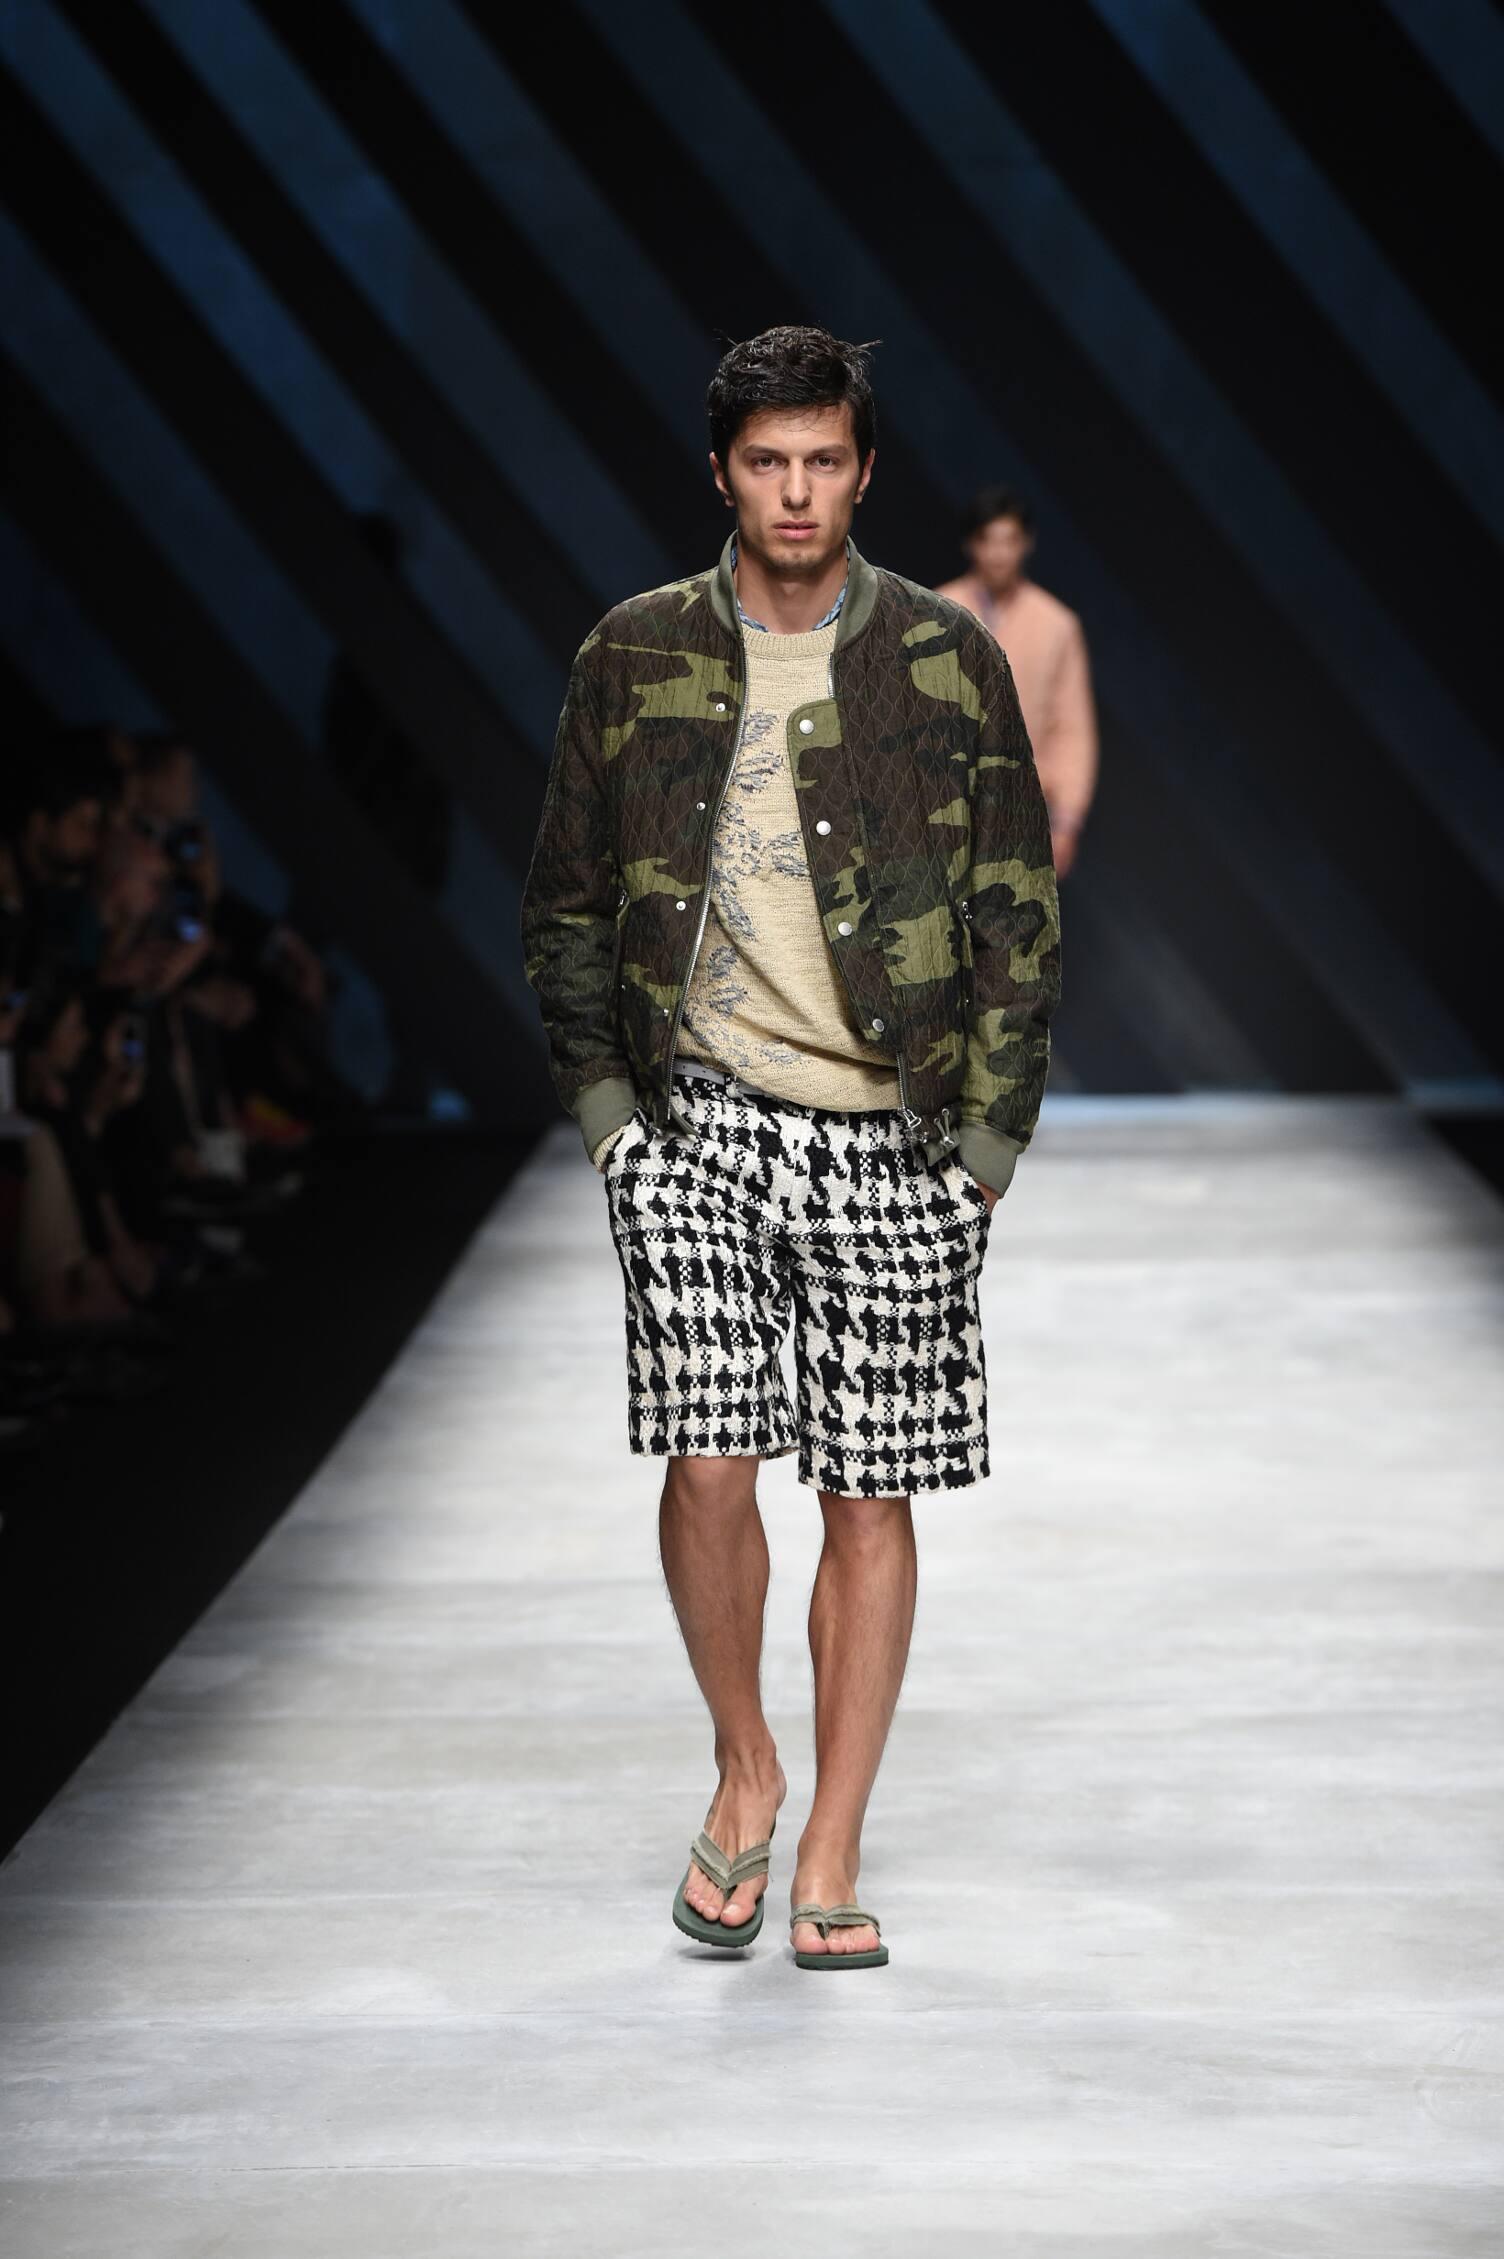 Spring 2016 Men Fashion Show Ermanno Scervino Collection